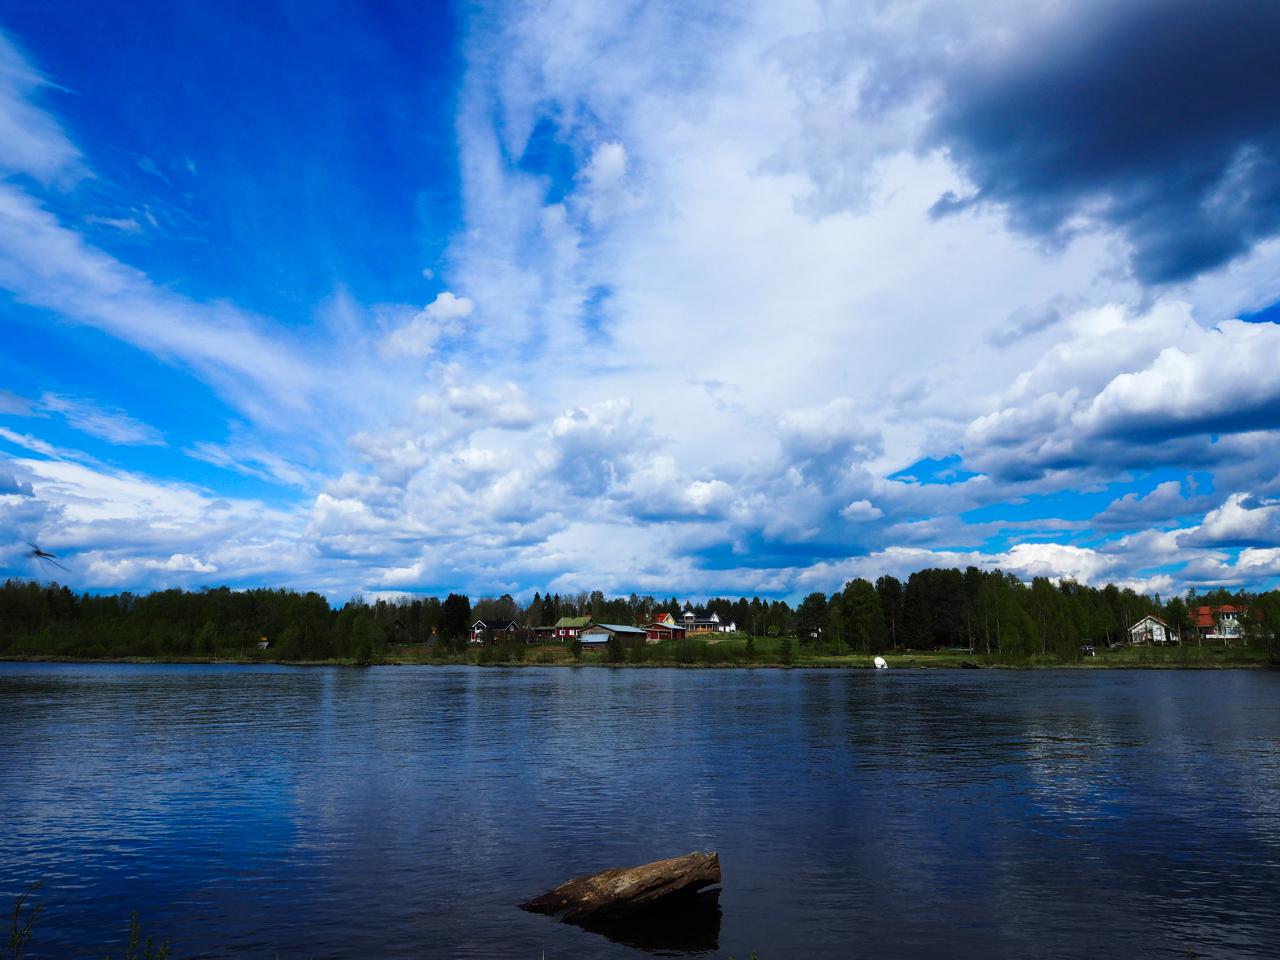 River Kitinen